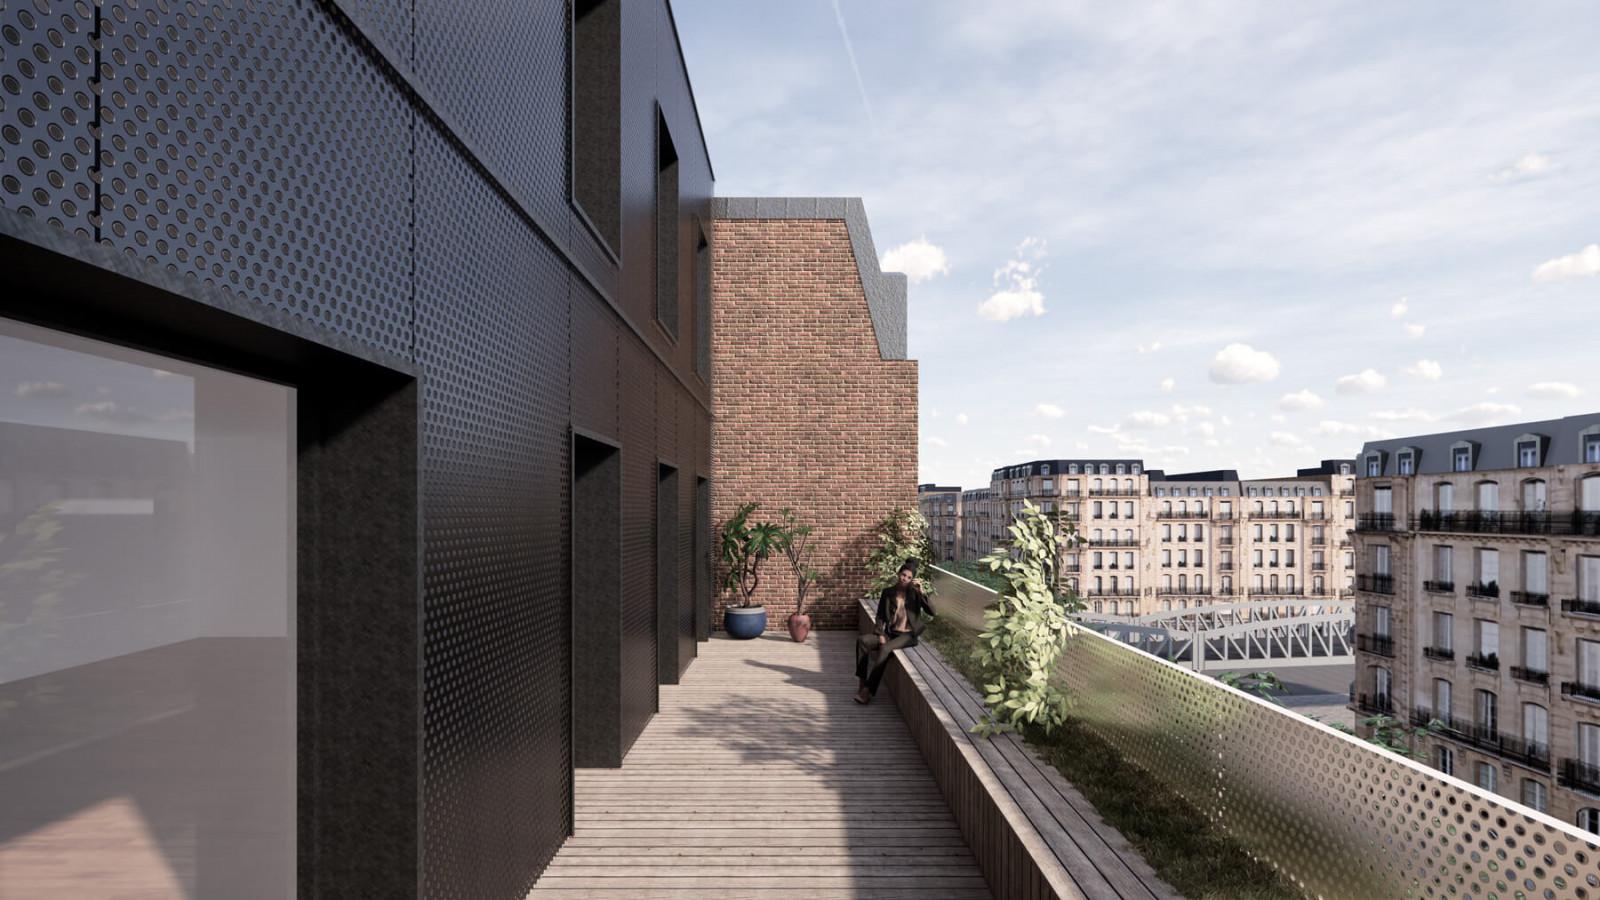 graam-barbes-02-logements-exterieur-terrasse-vegetation